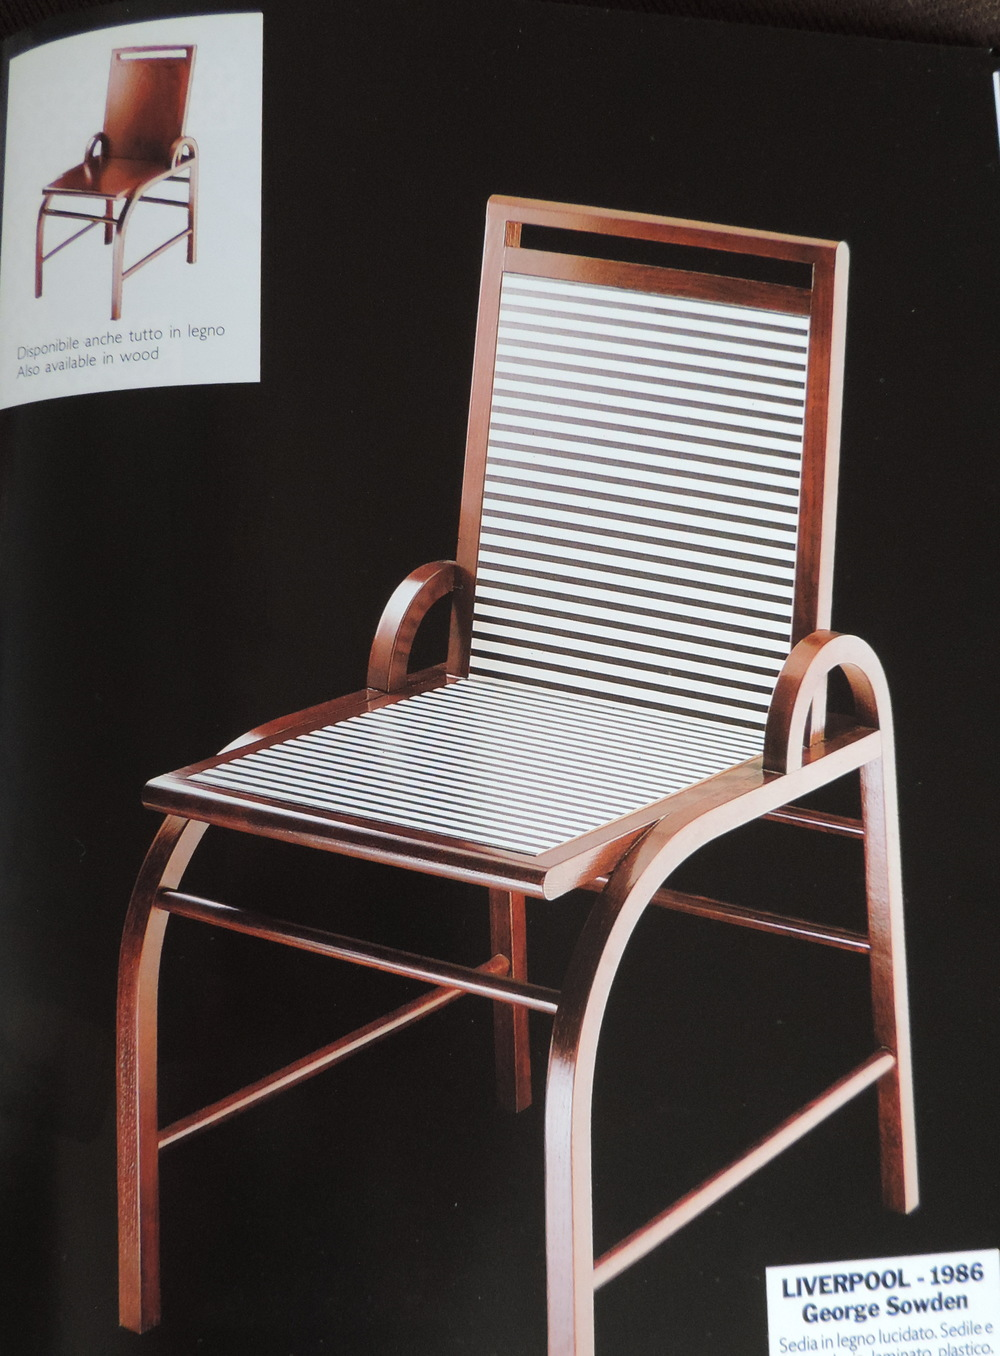 Liverpool Chair for Memphis Milano 1986. Image: (c) Memphis Milano 1991